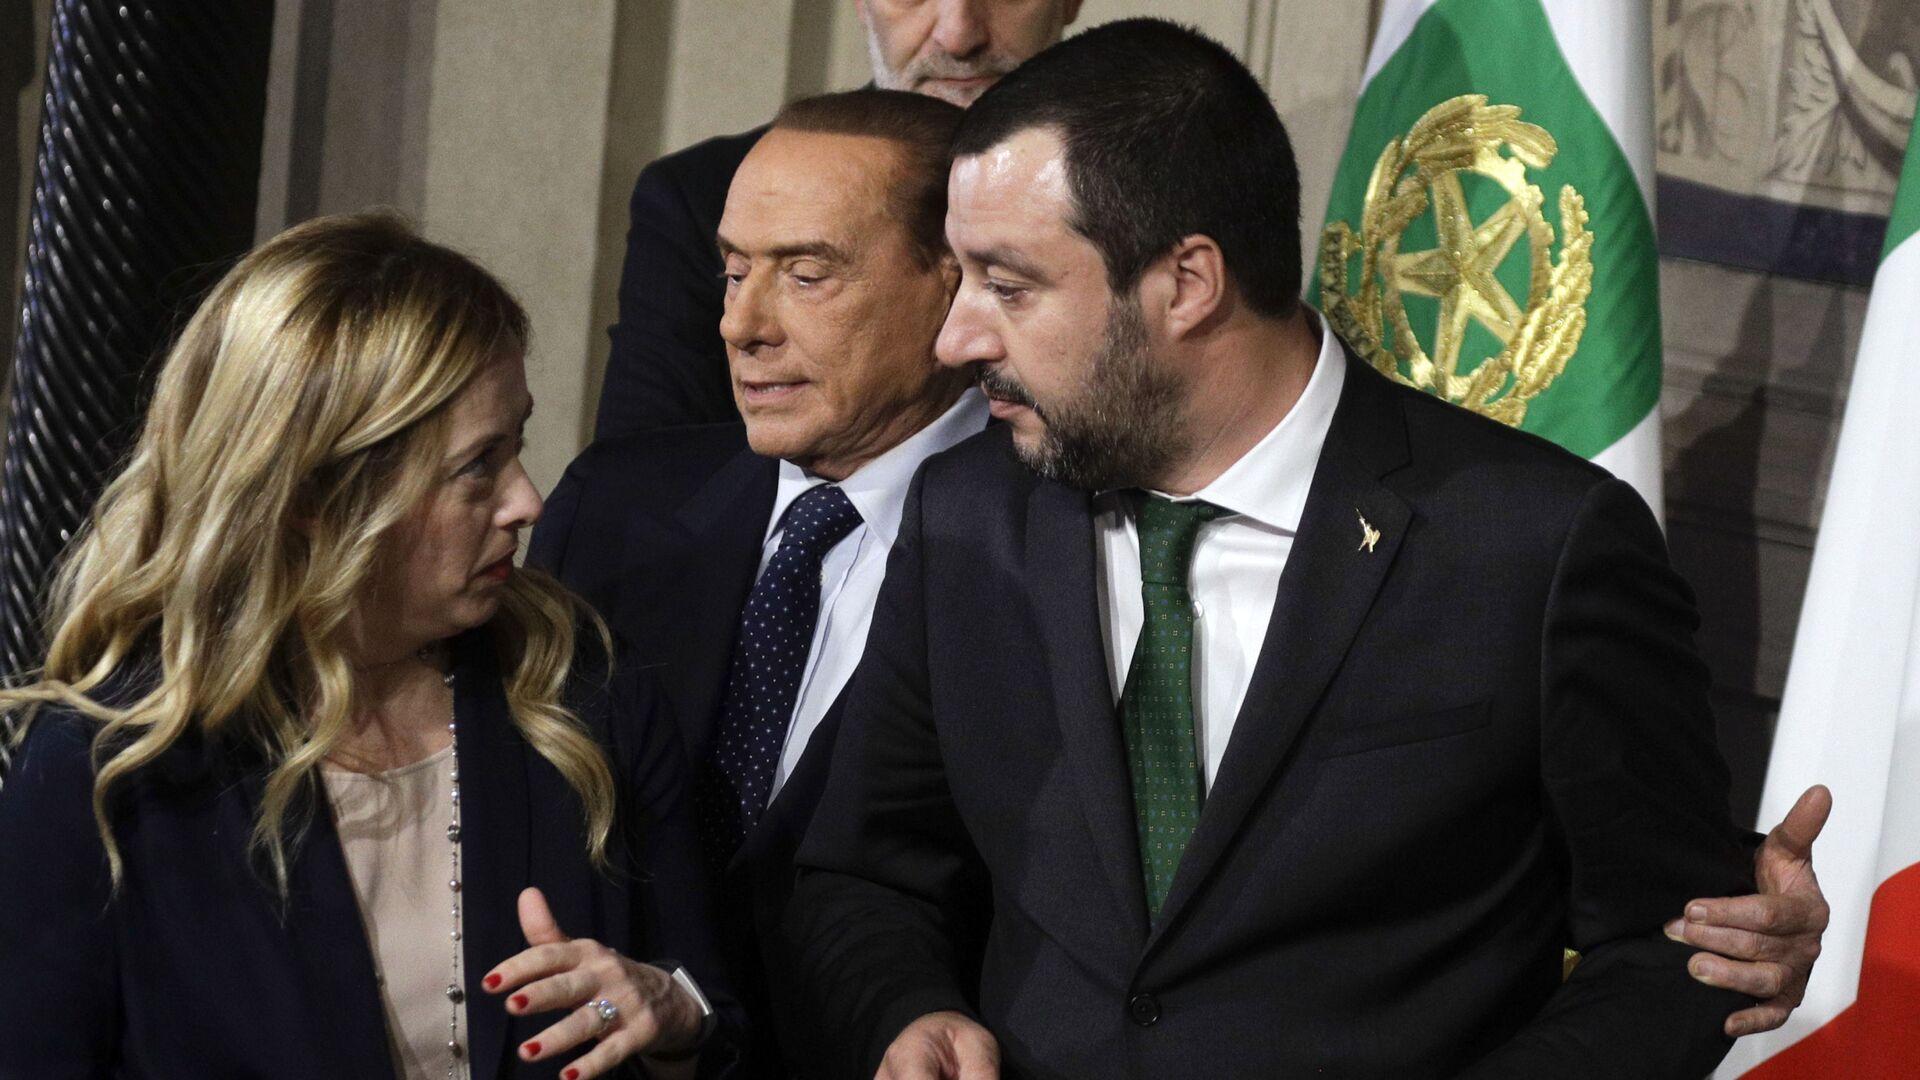 Matteo Salvini e Giorgia Meloni e Silvio Berlusconi - Sputnik Italia, 1920, 07.06.2021